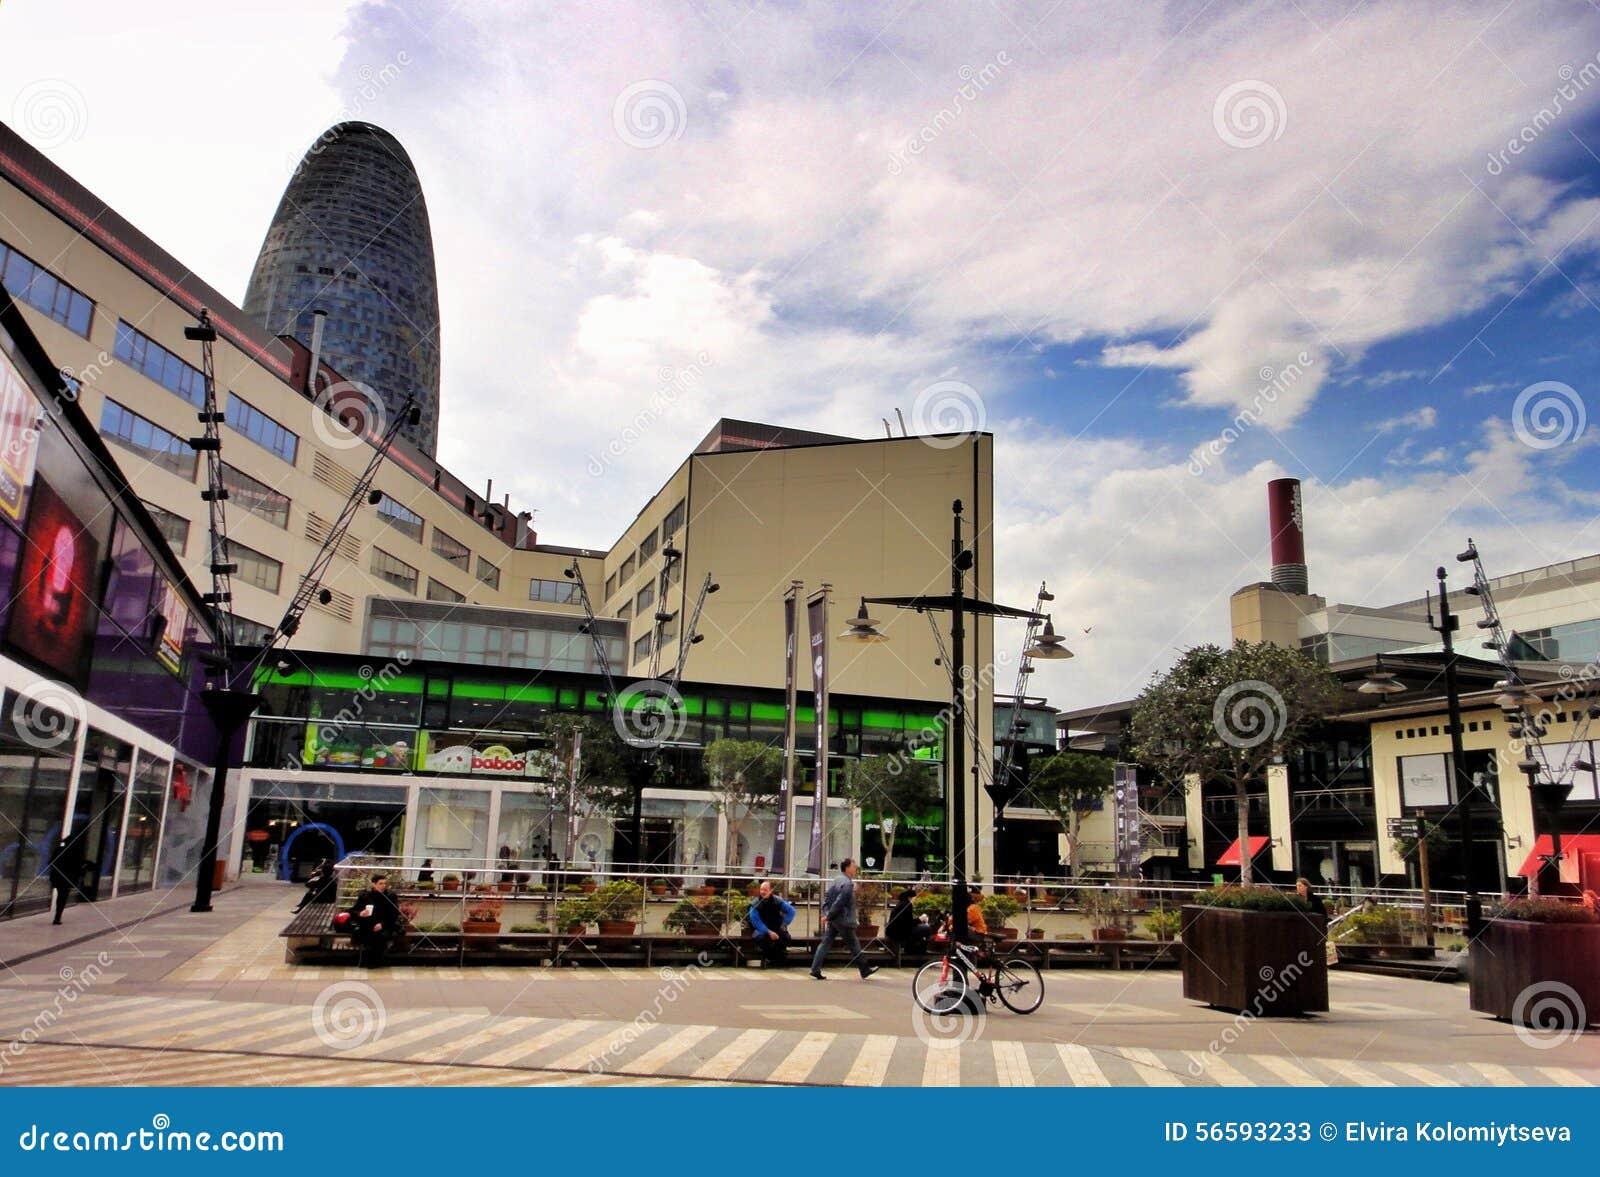 Centro commerciale diagonale a Barcellona, Spagna